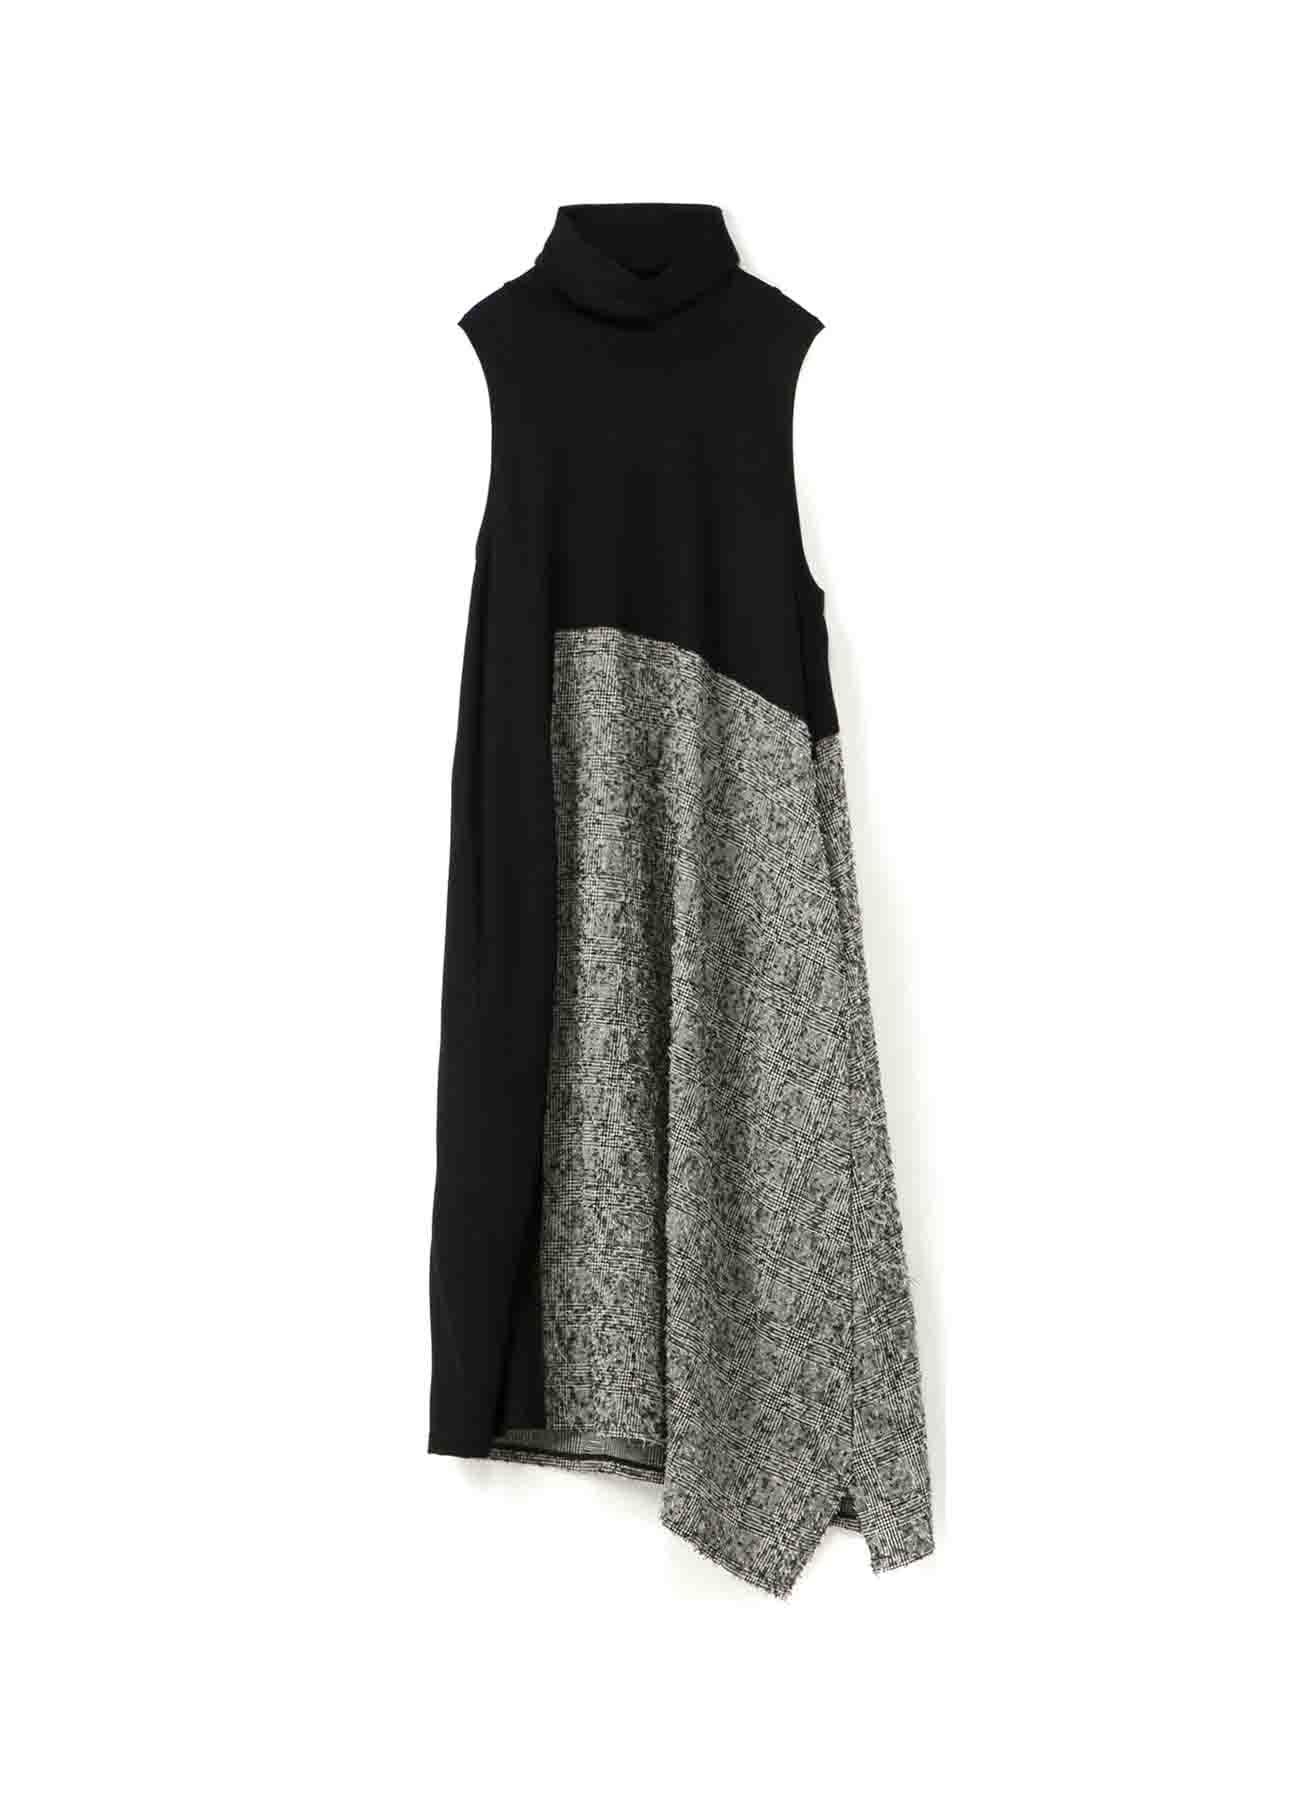 WOOL GLEN CHECK NEEDLE PUNCH HIGHT NECK SLVLESS DRESS